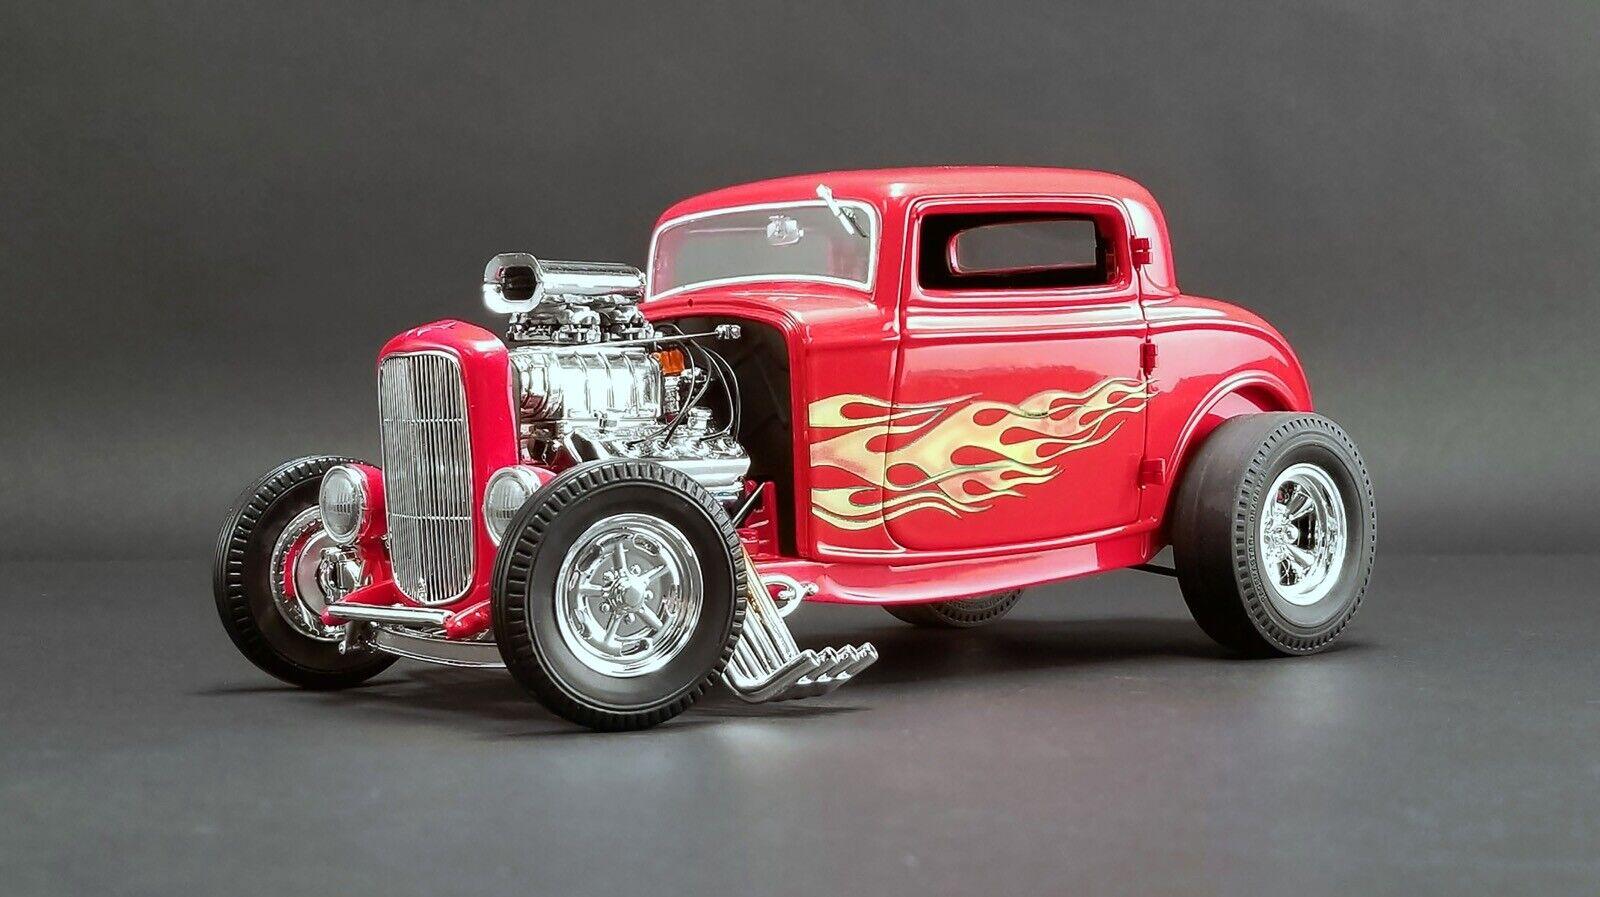 1932 1 18 Ford 3-window Coupe The Lanzallamas Acme por Pedido Le MIB